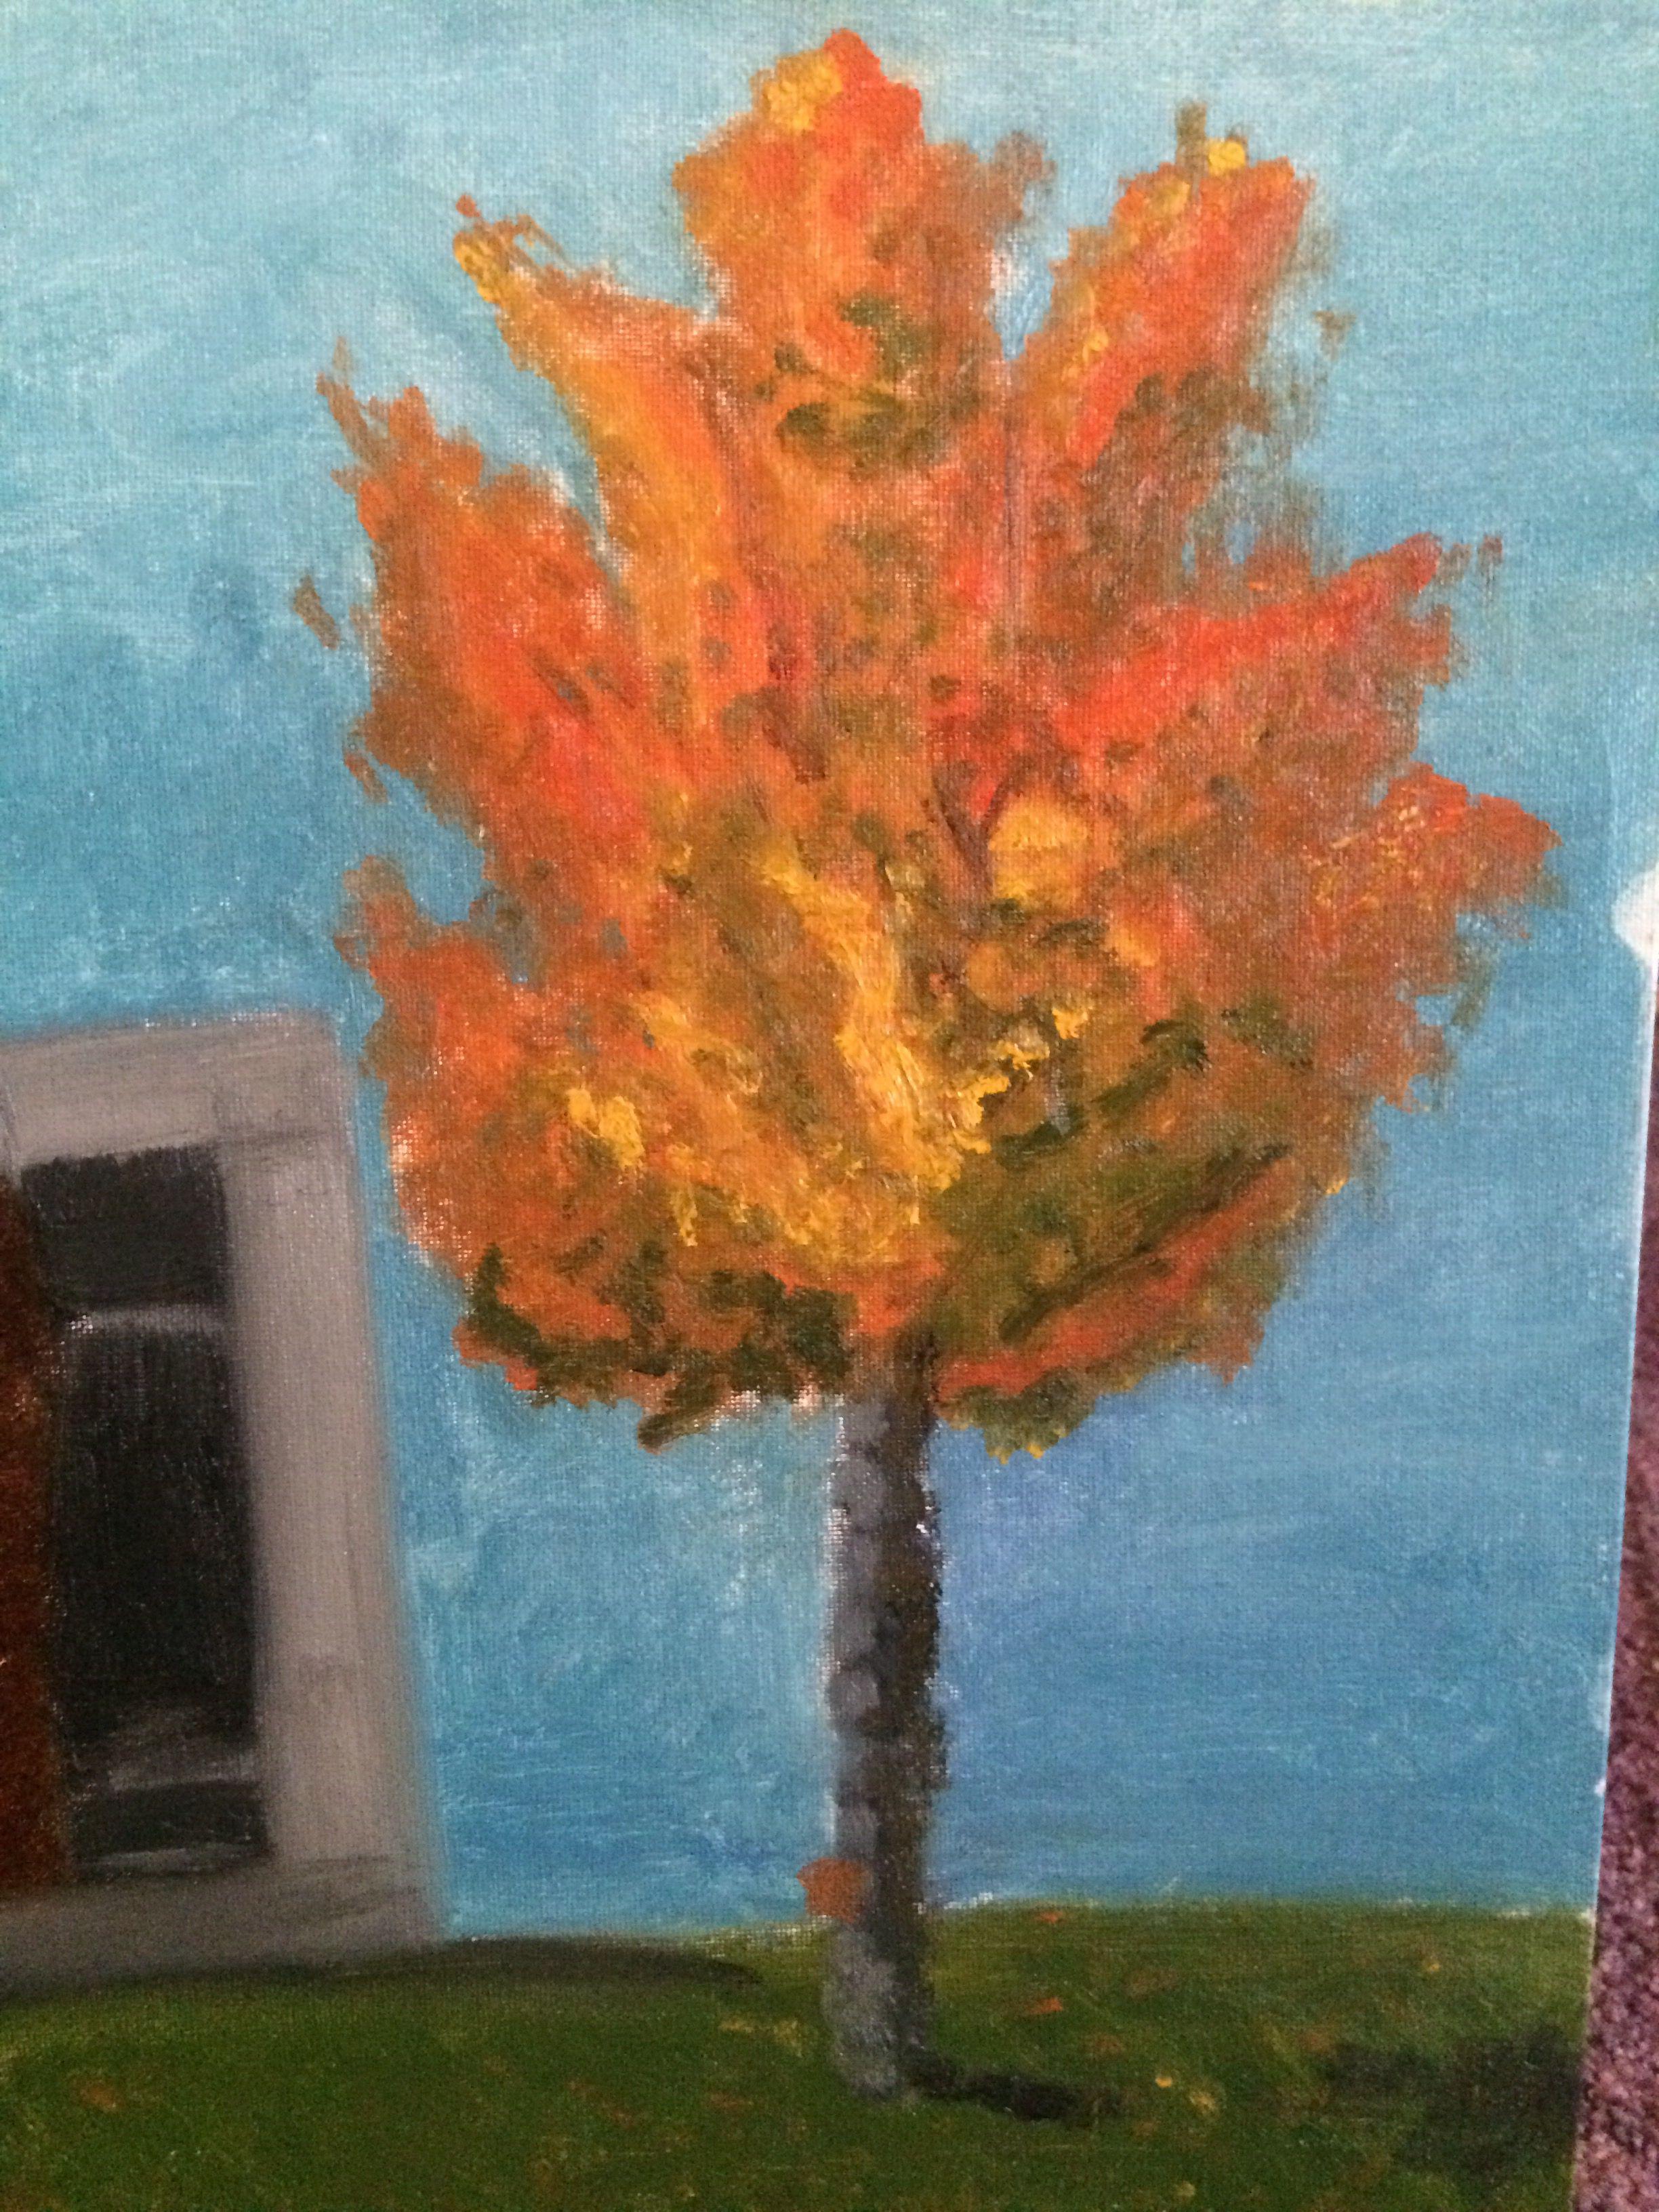 Fall tree in oil paint.